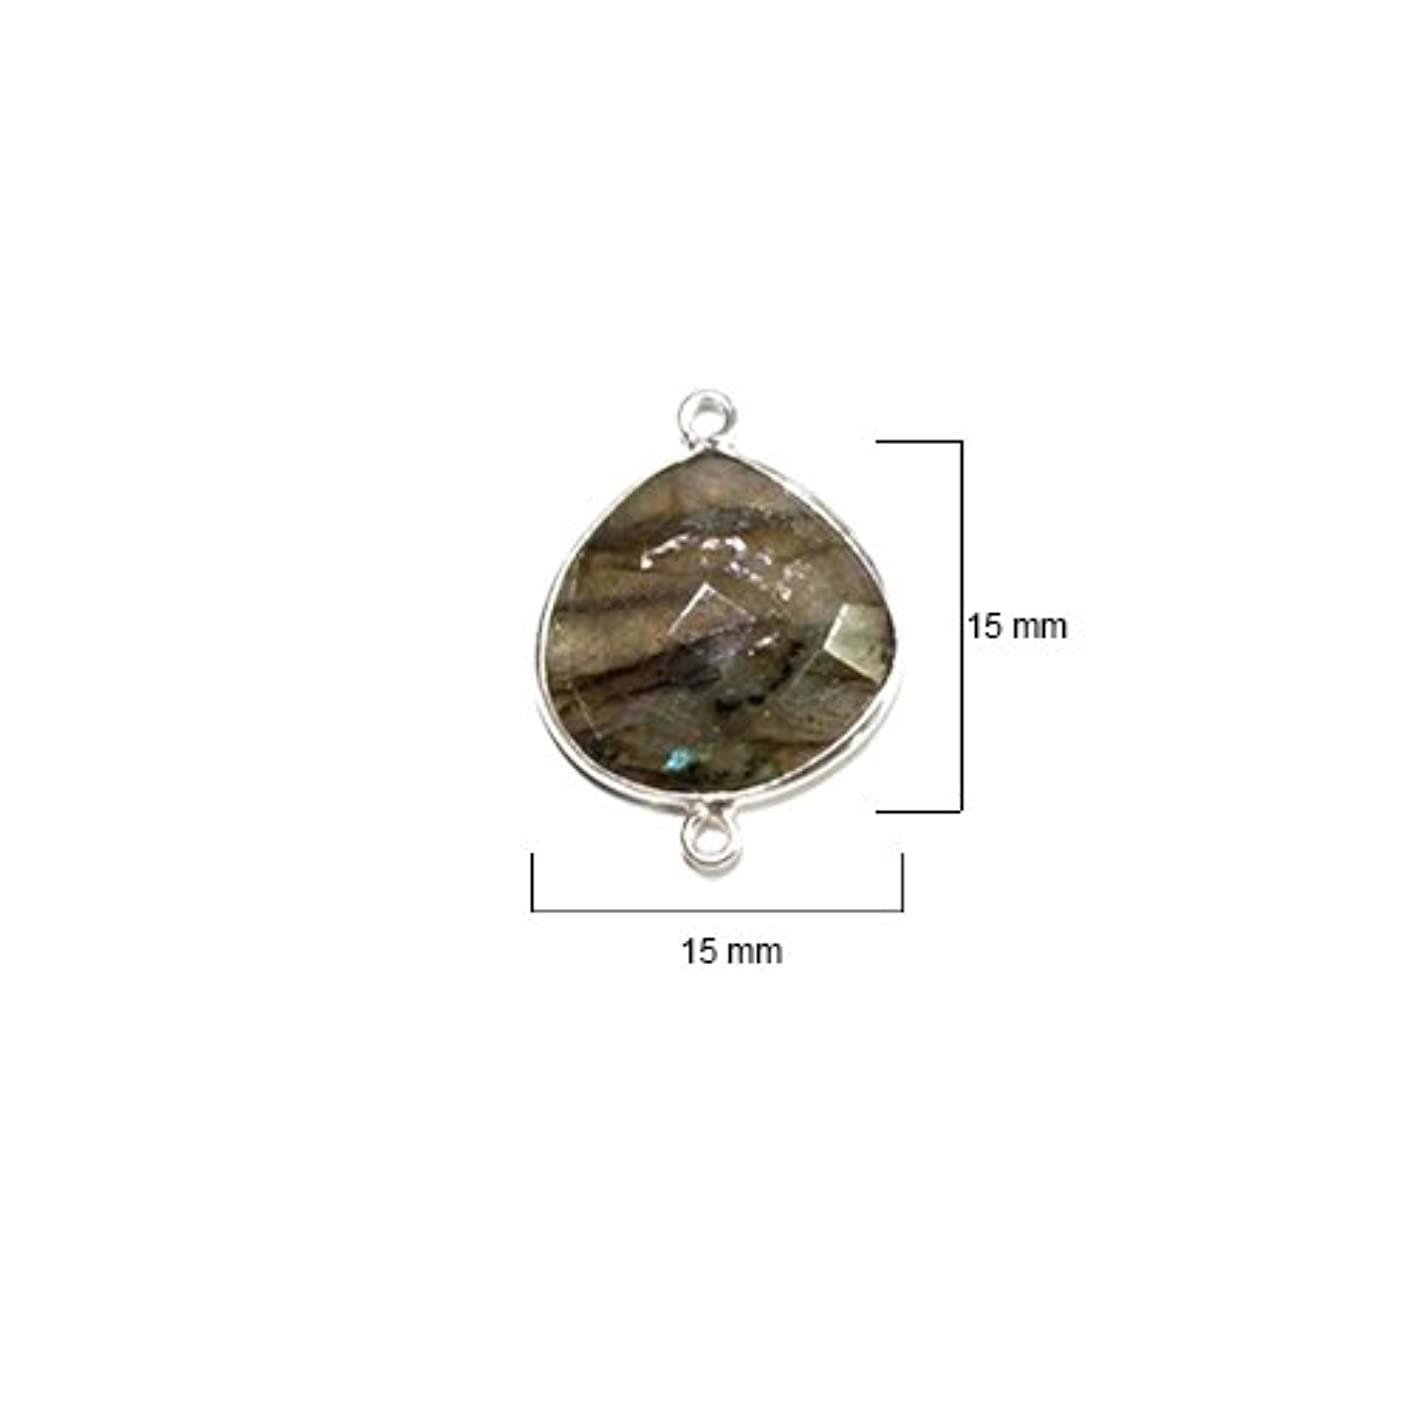 2 Pcs Labradorite Heart 15mm by BESTINBEADS I Labradorite Stone I Labradorite Heart Pendant I Heart Pendant Silver I Bezels Connectors I Labradorite Pendant Silver I Heart Bezel